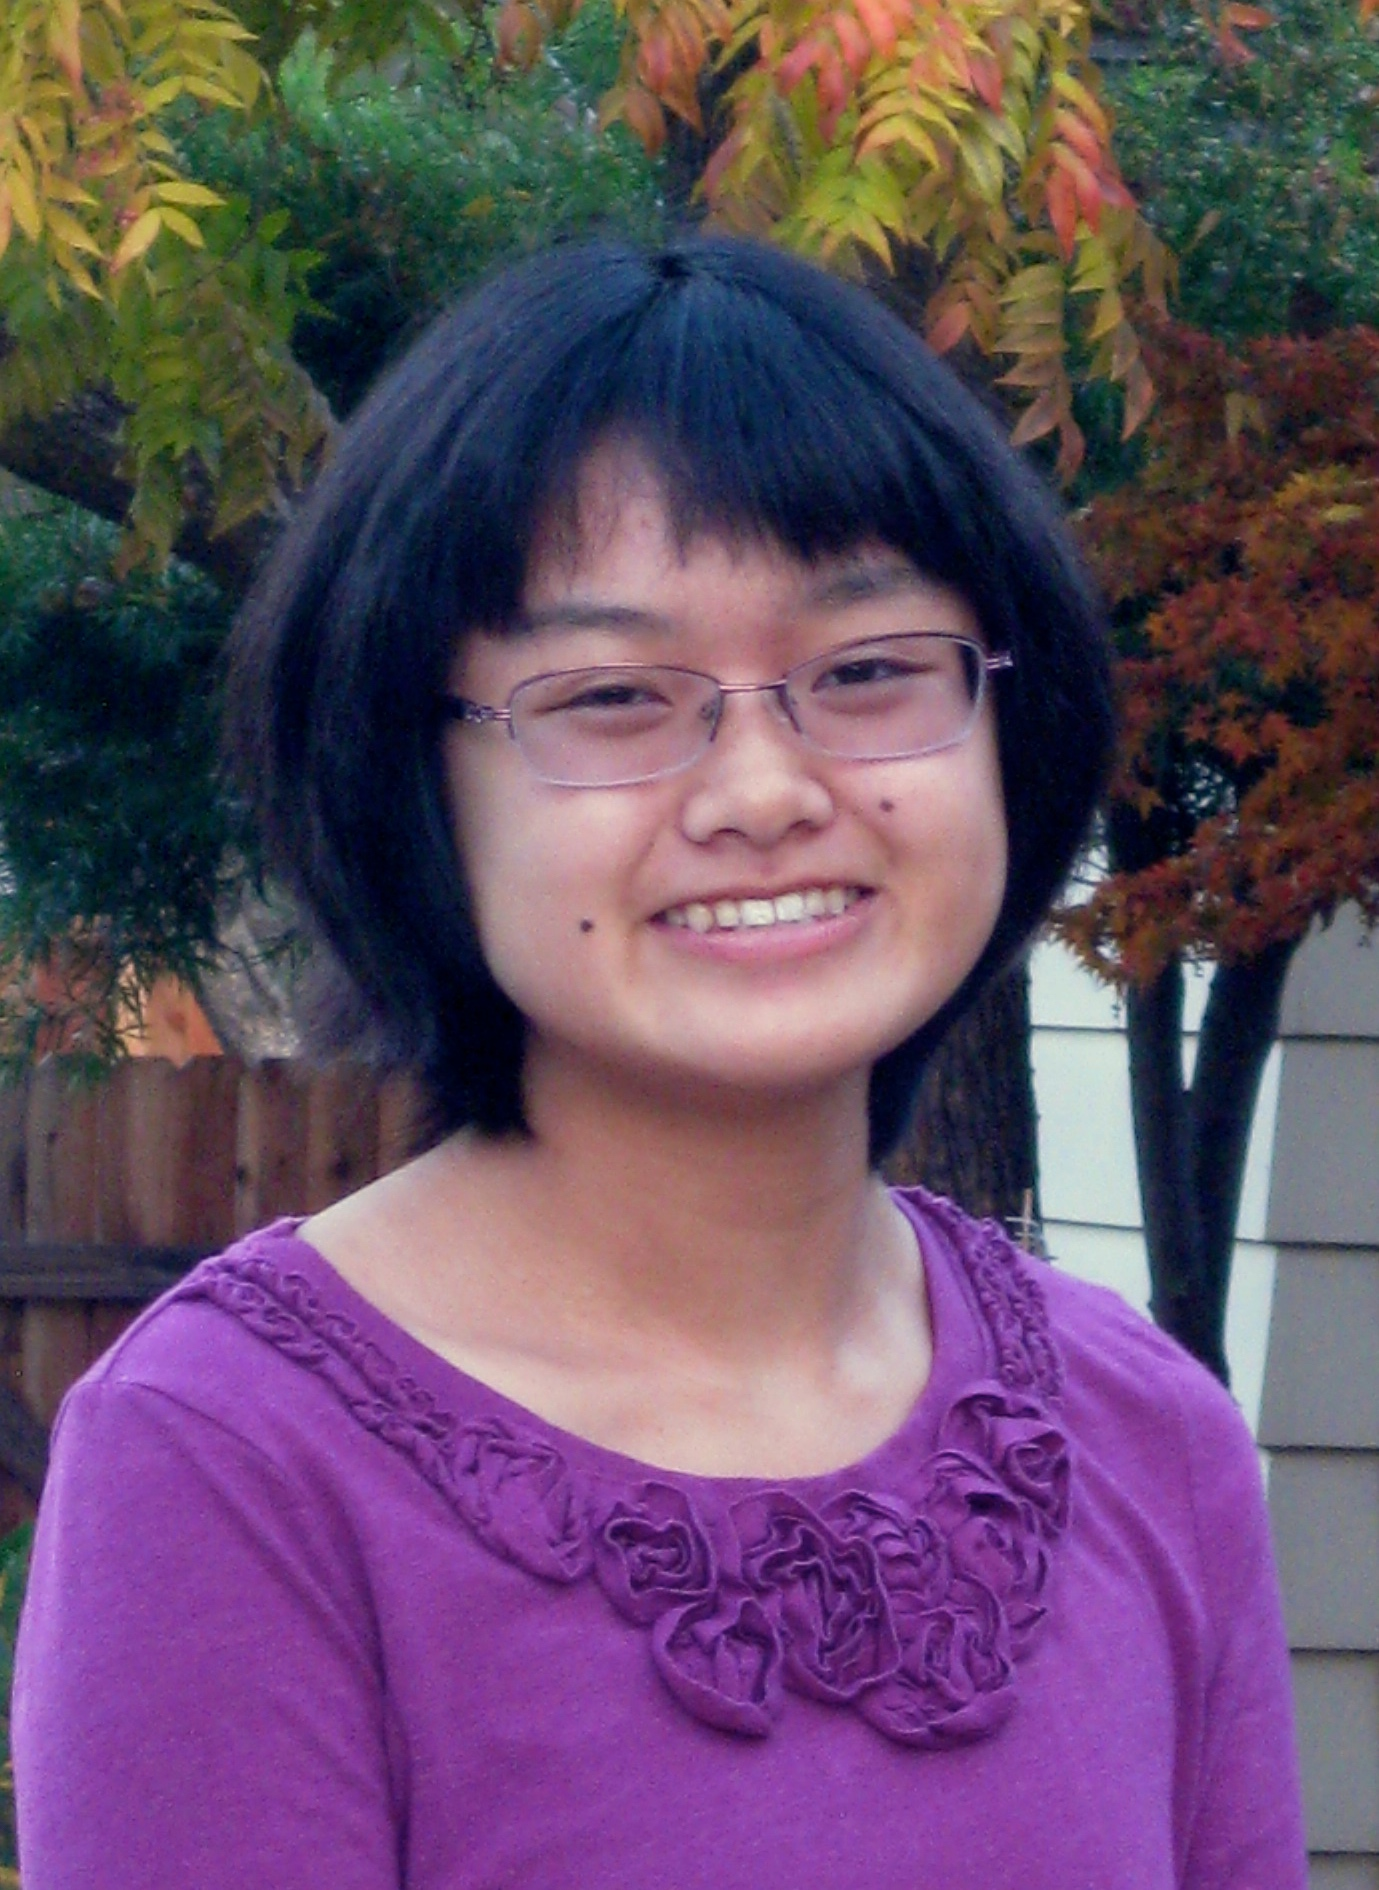 Emily Kobayashi   18, studying bioinformatics at UC Santa Cruz